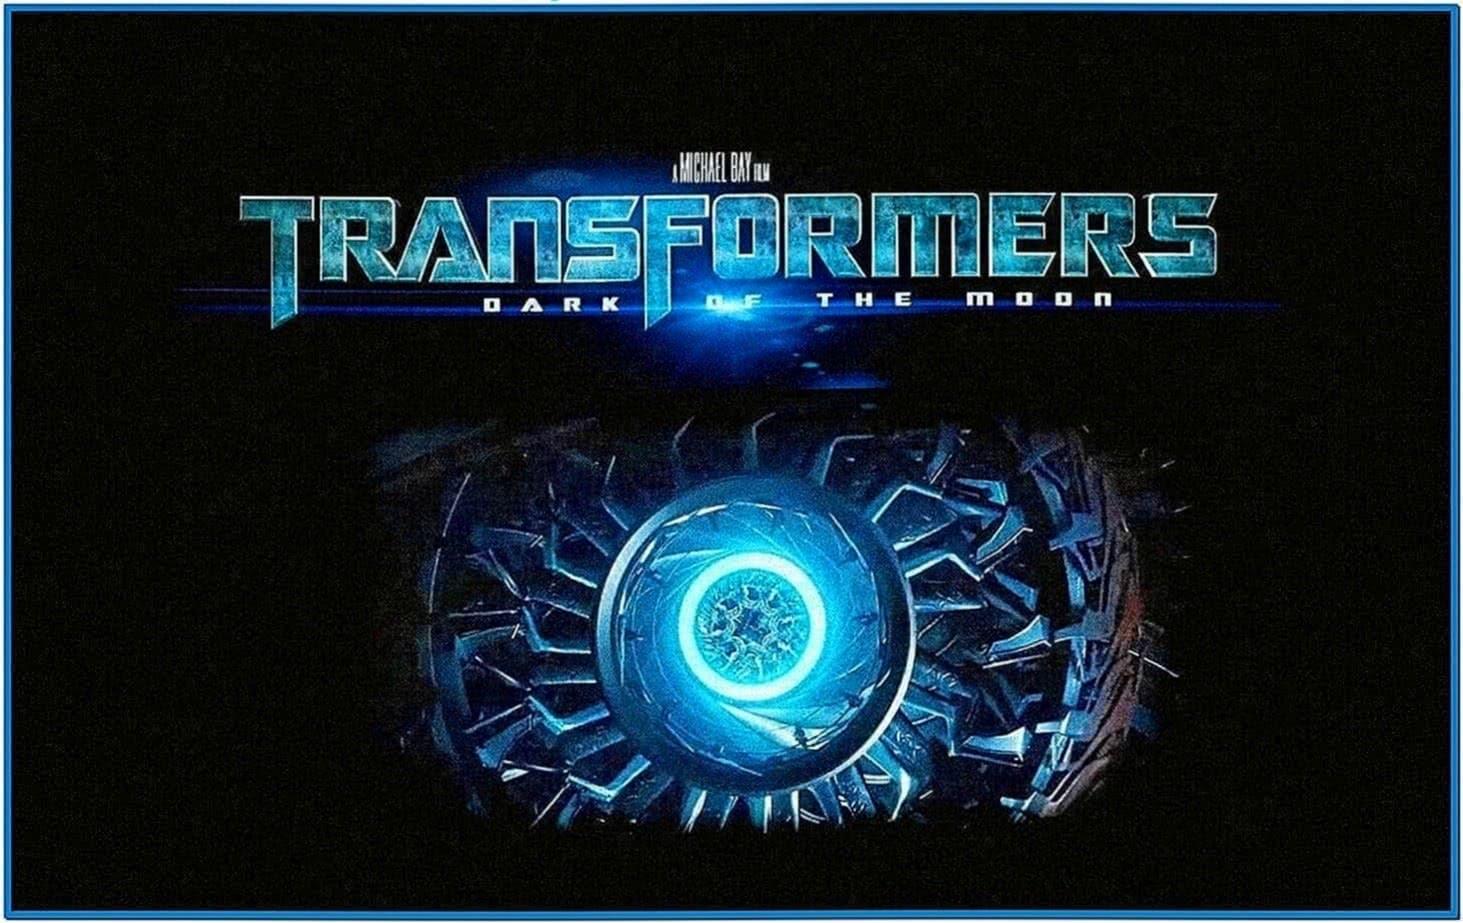 Transformers 3 Dark of The Moon Screensaver